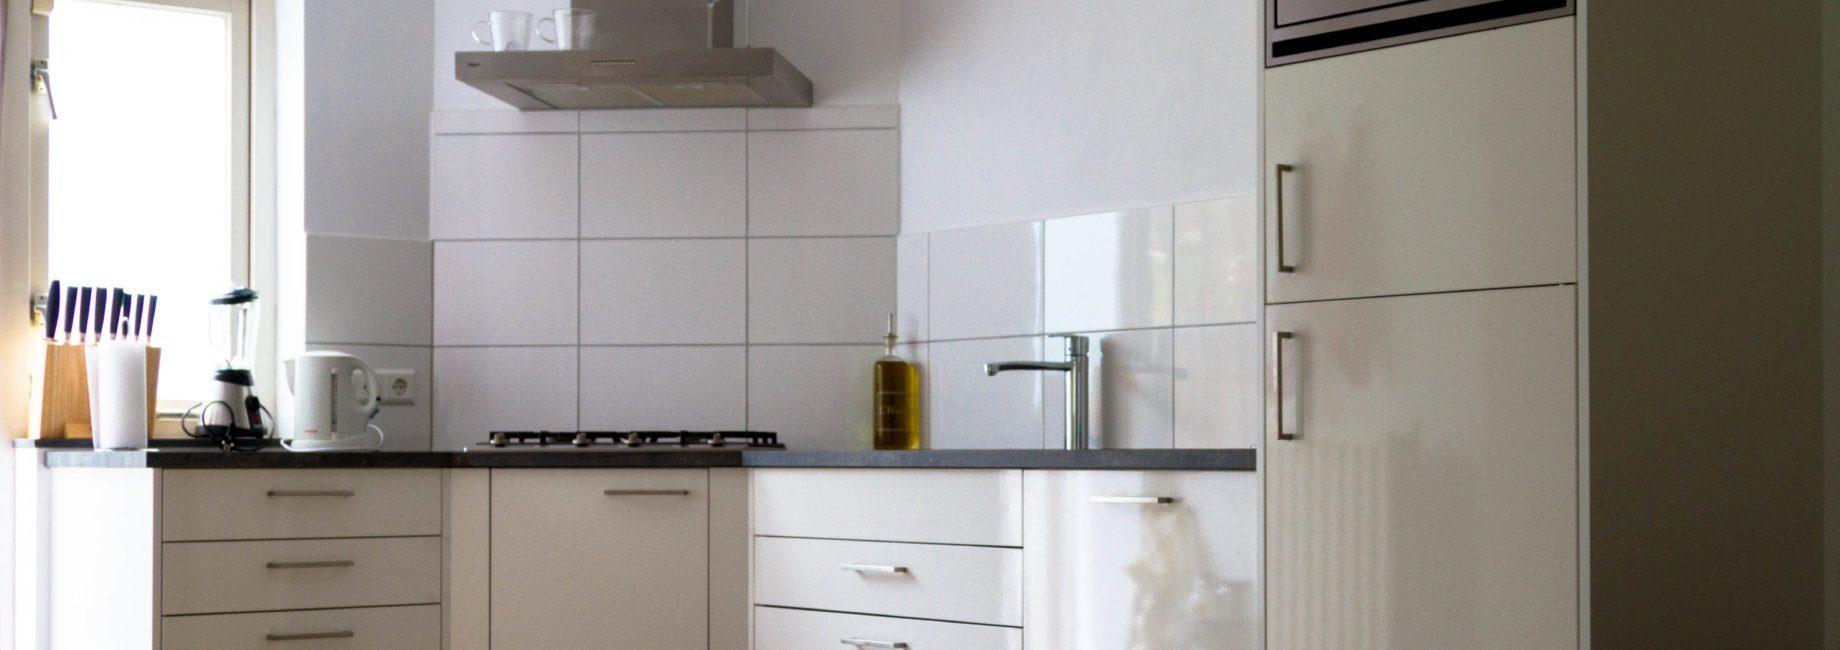 Moderne-keuken-hoogglans